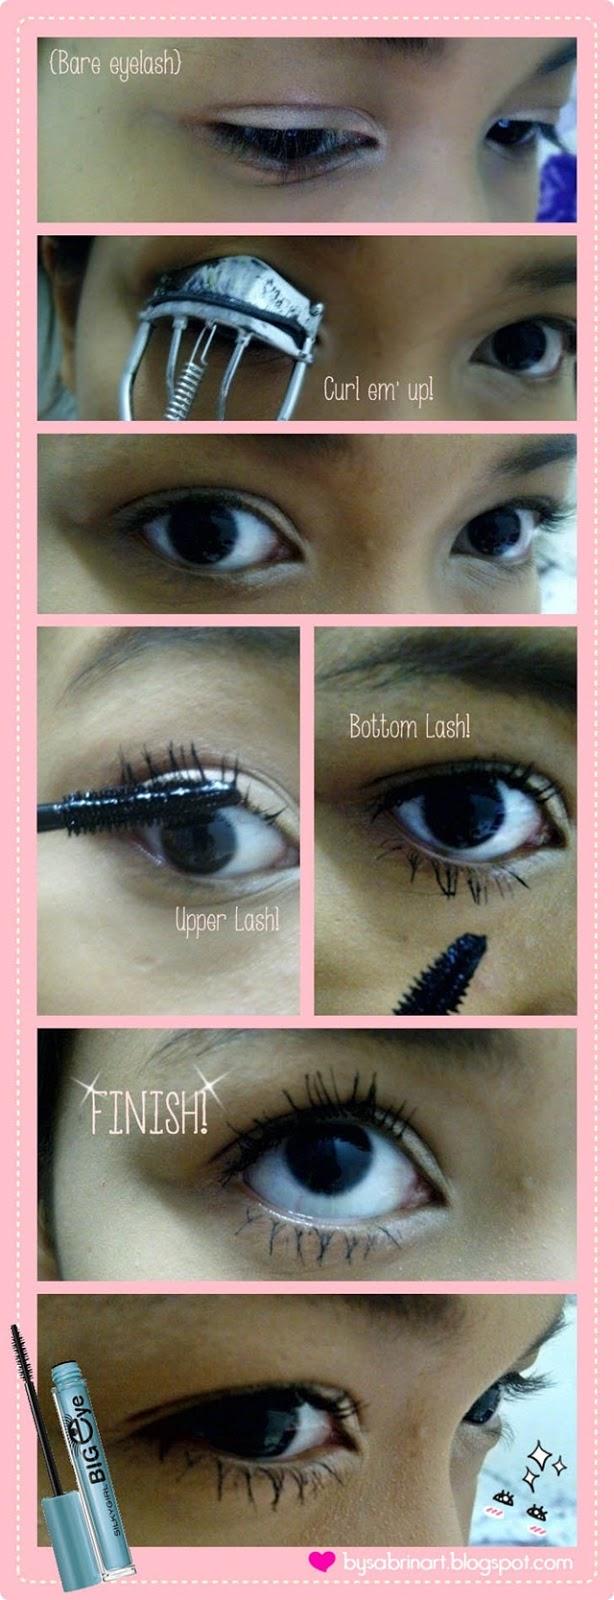 Best Mascara For Big Eyes photos